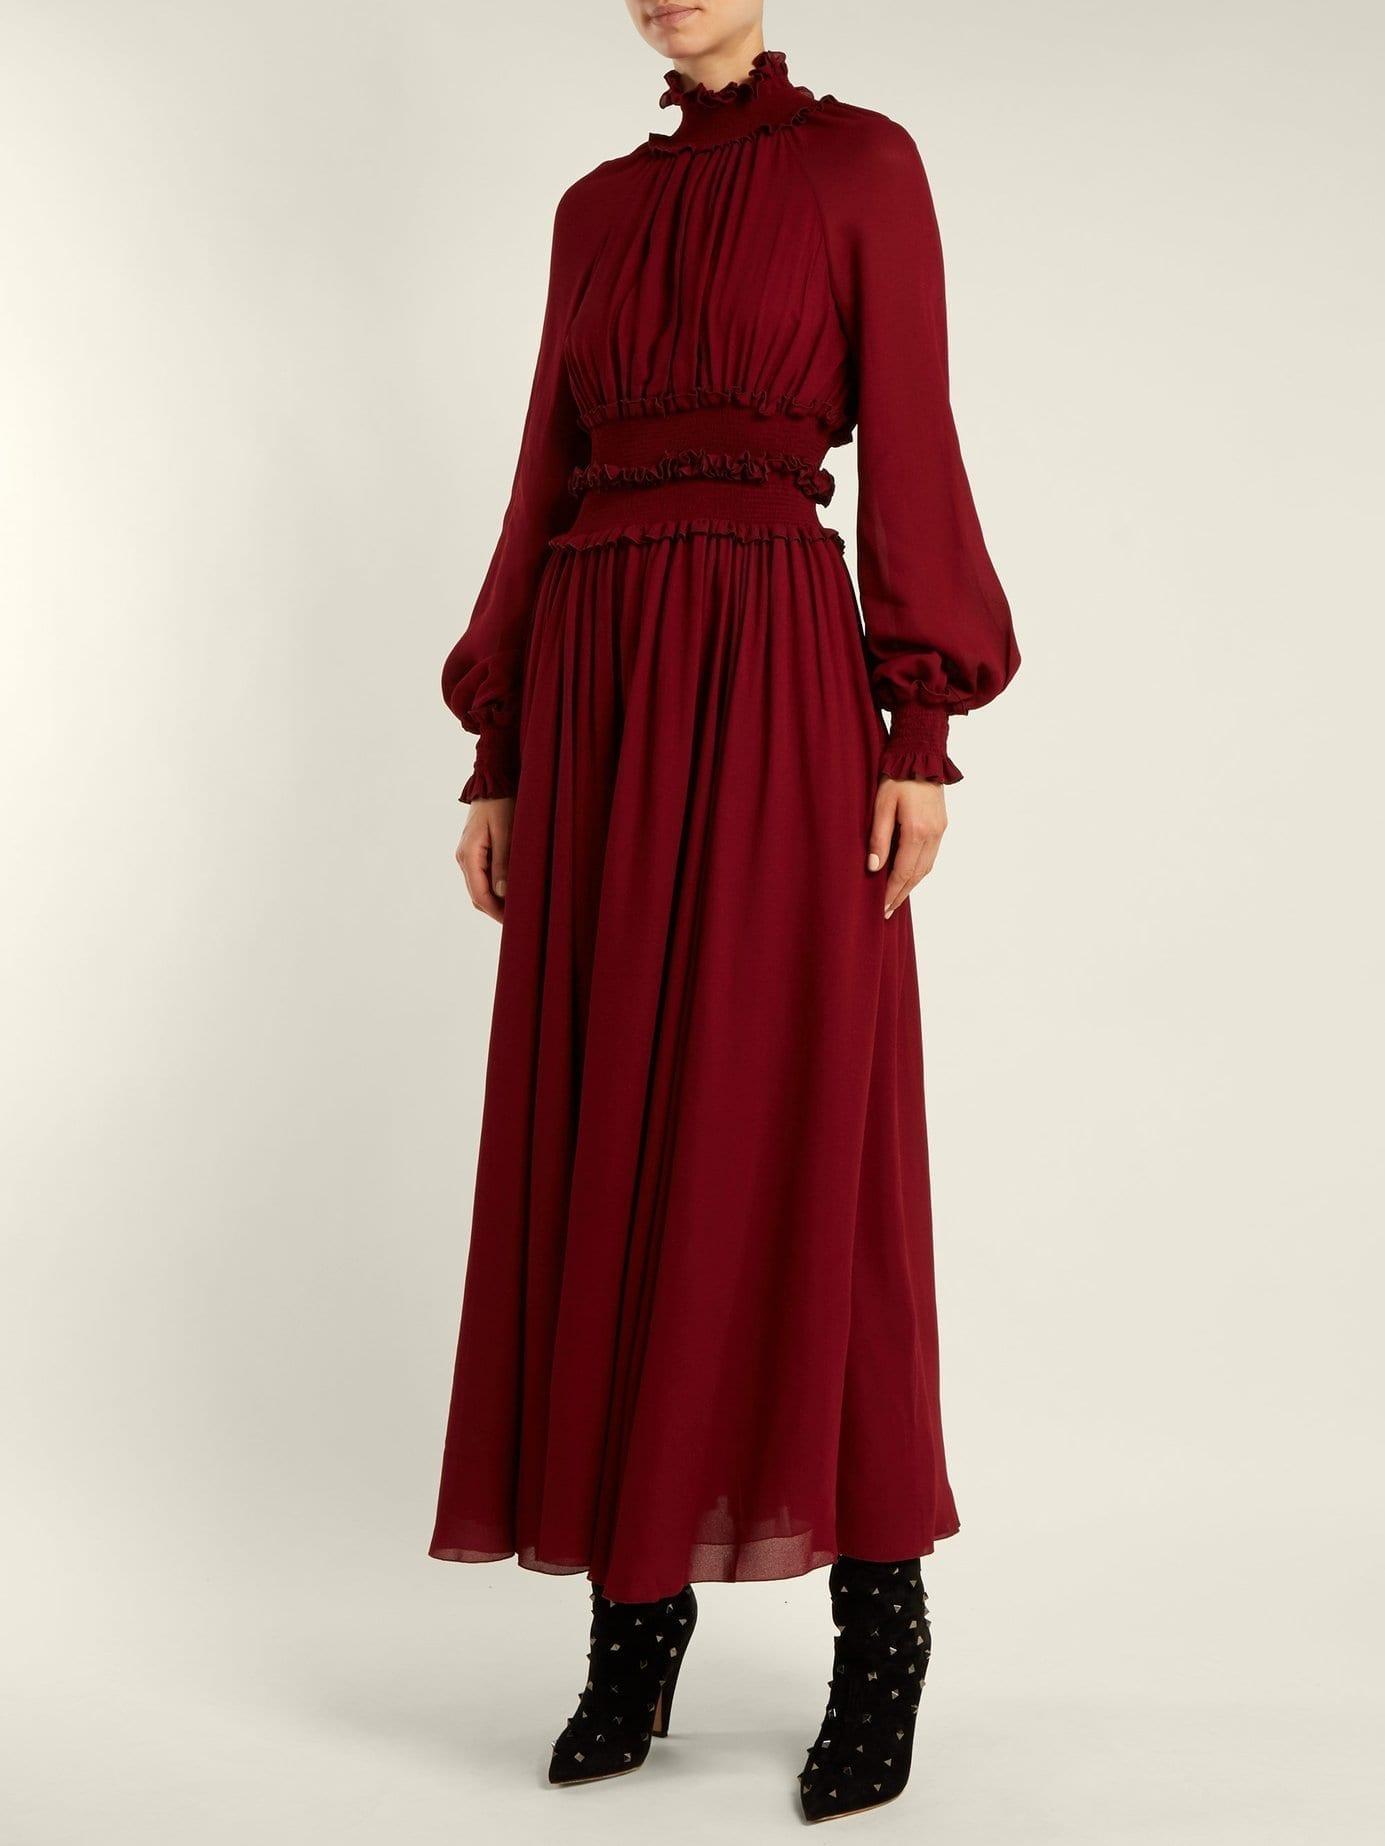 GIAMBATTISTA VALLI High Ruffle Neck Burgundy Dress